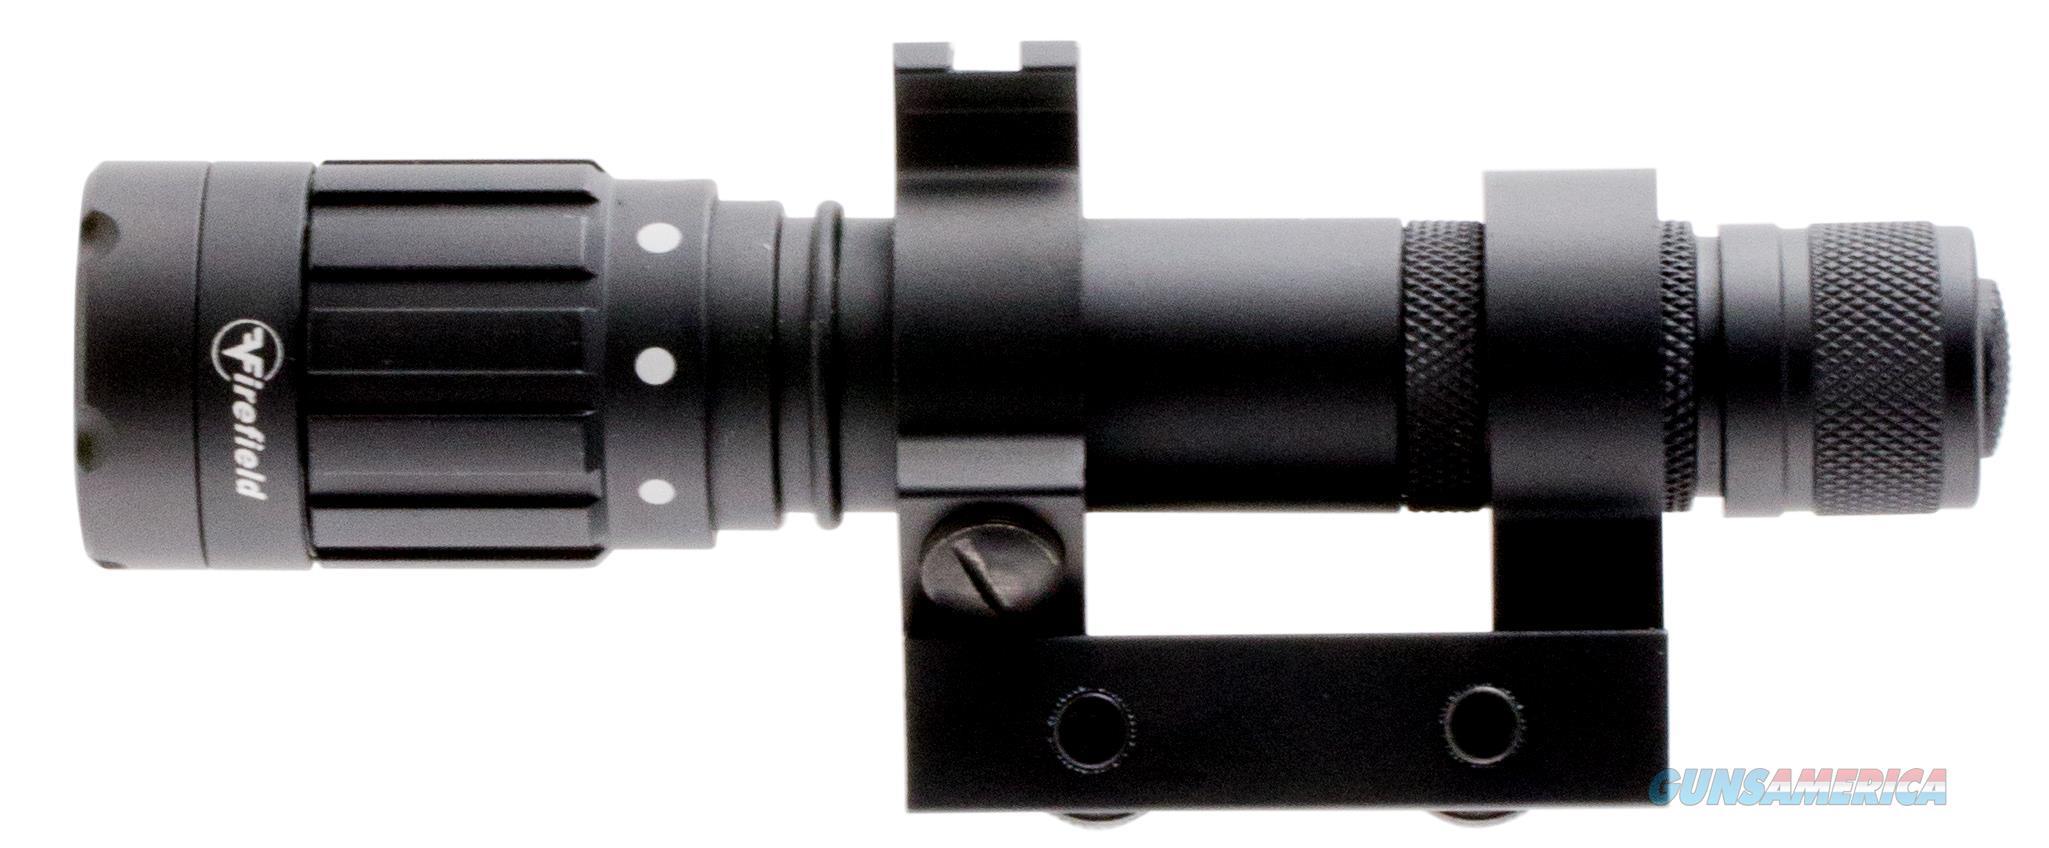 Firefield Ff25003 Hog Designator Green Laser Universal W/Picatinny Rail FF25003  Non-Guns > Iron/Metal/Peep Sights